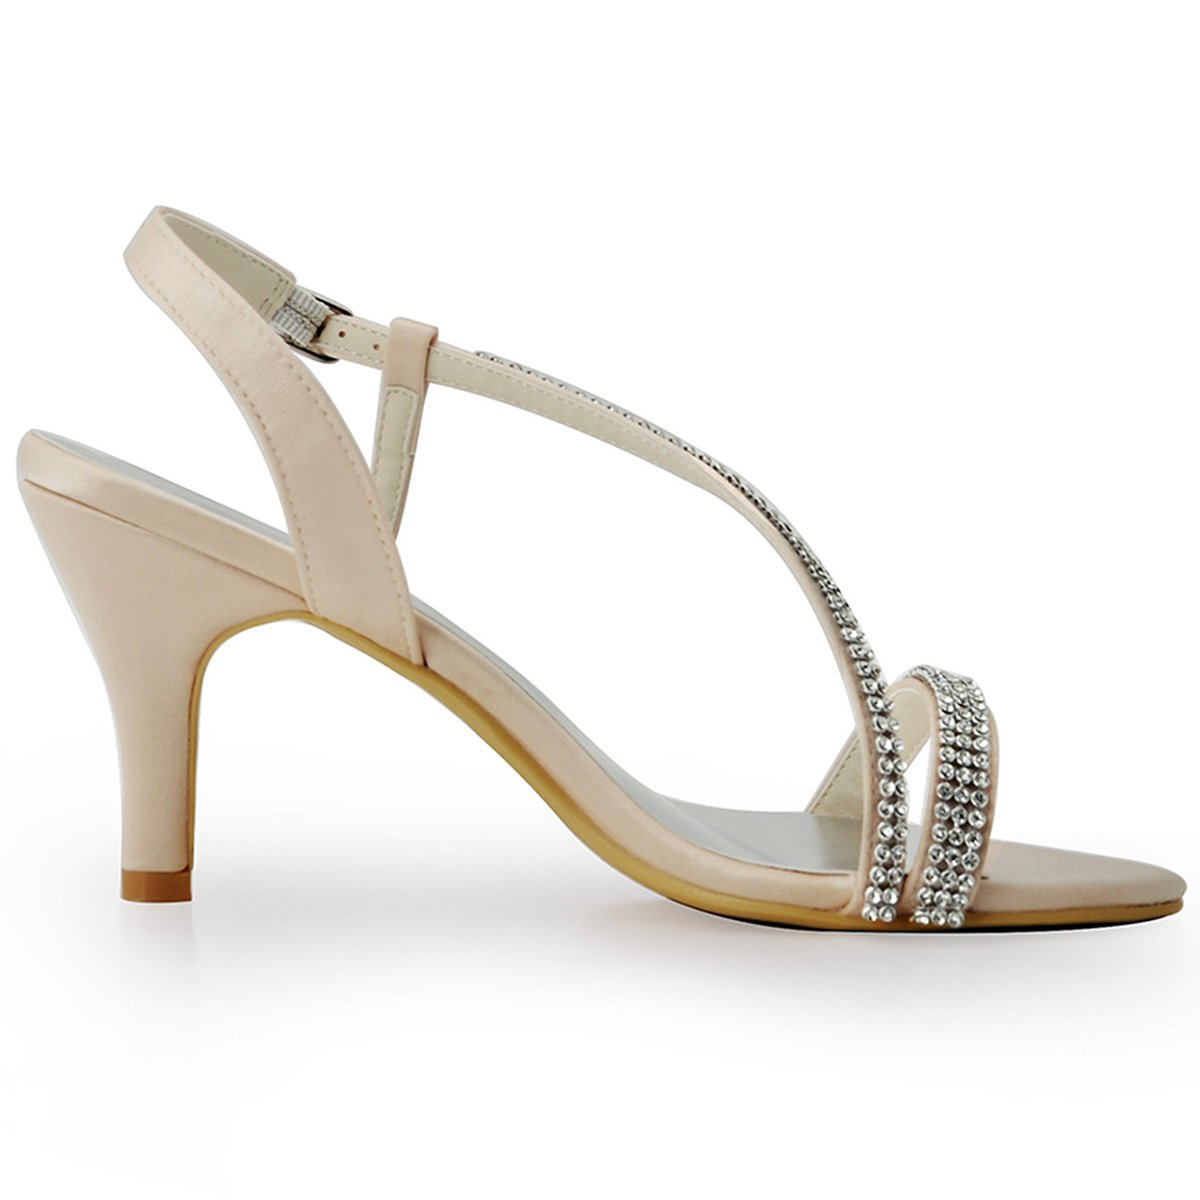 ElegantPark Women Open Toe High Heel Rhinestones Satin Prom Evening Sandals